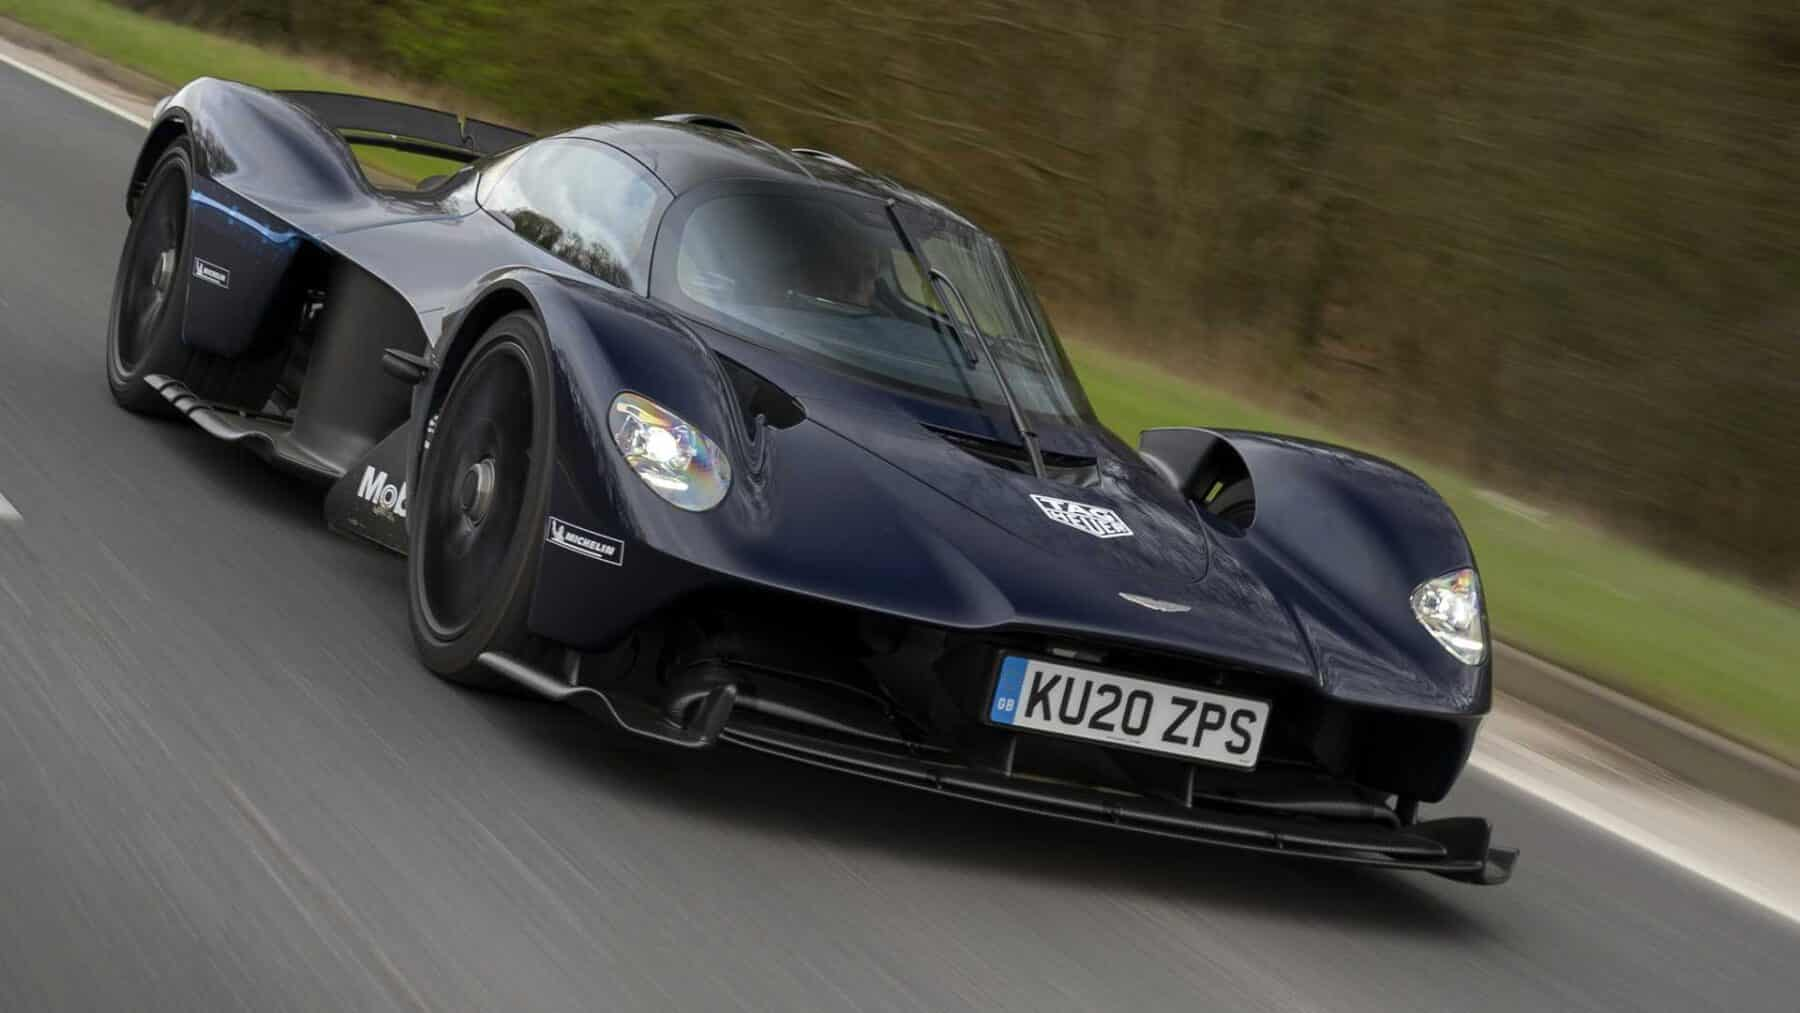 Veremos un Aston Martin Valkyrie Roadster